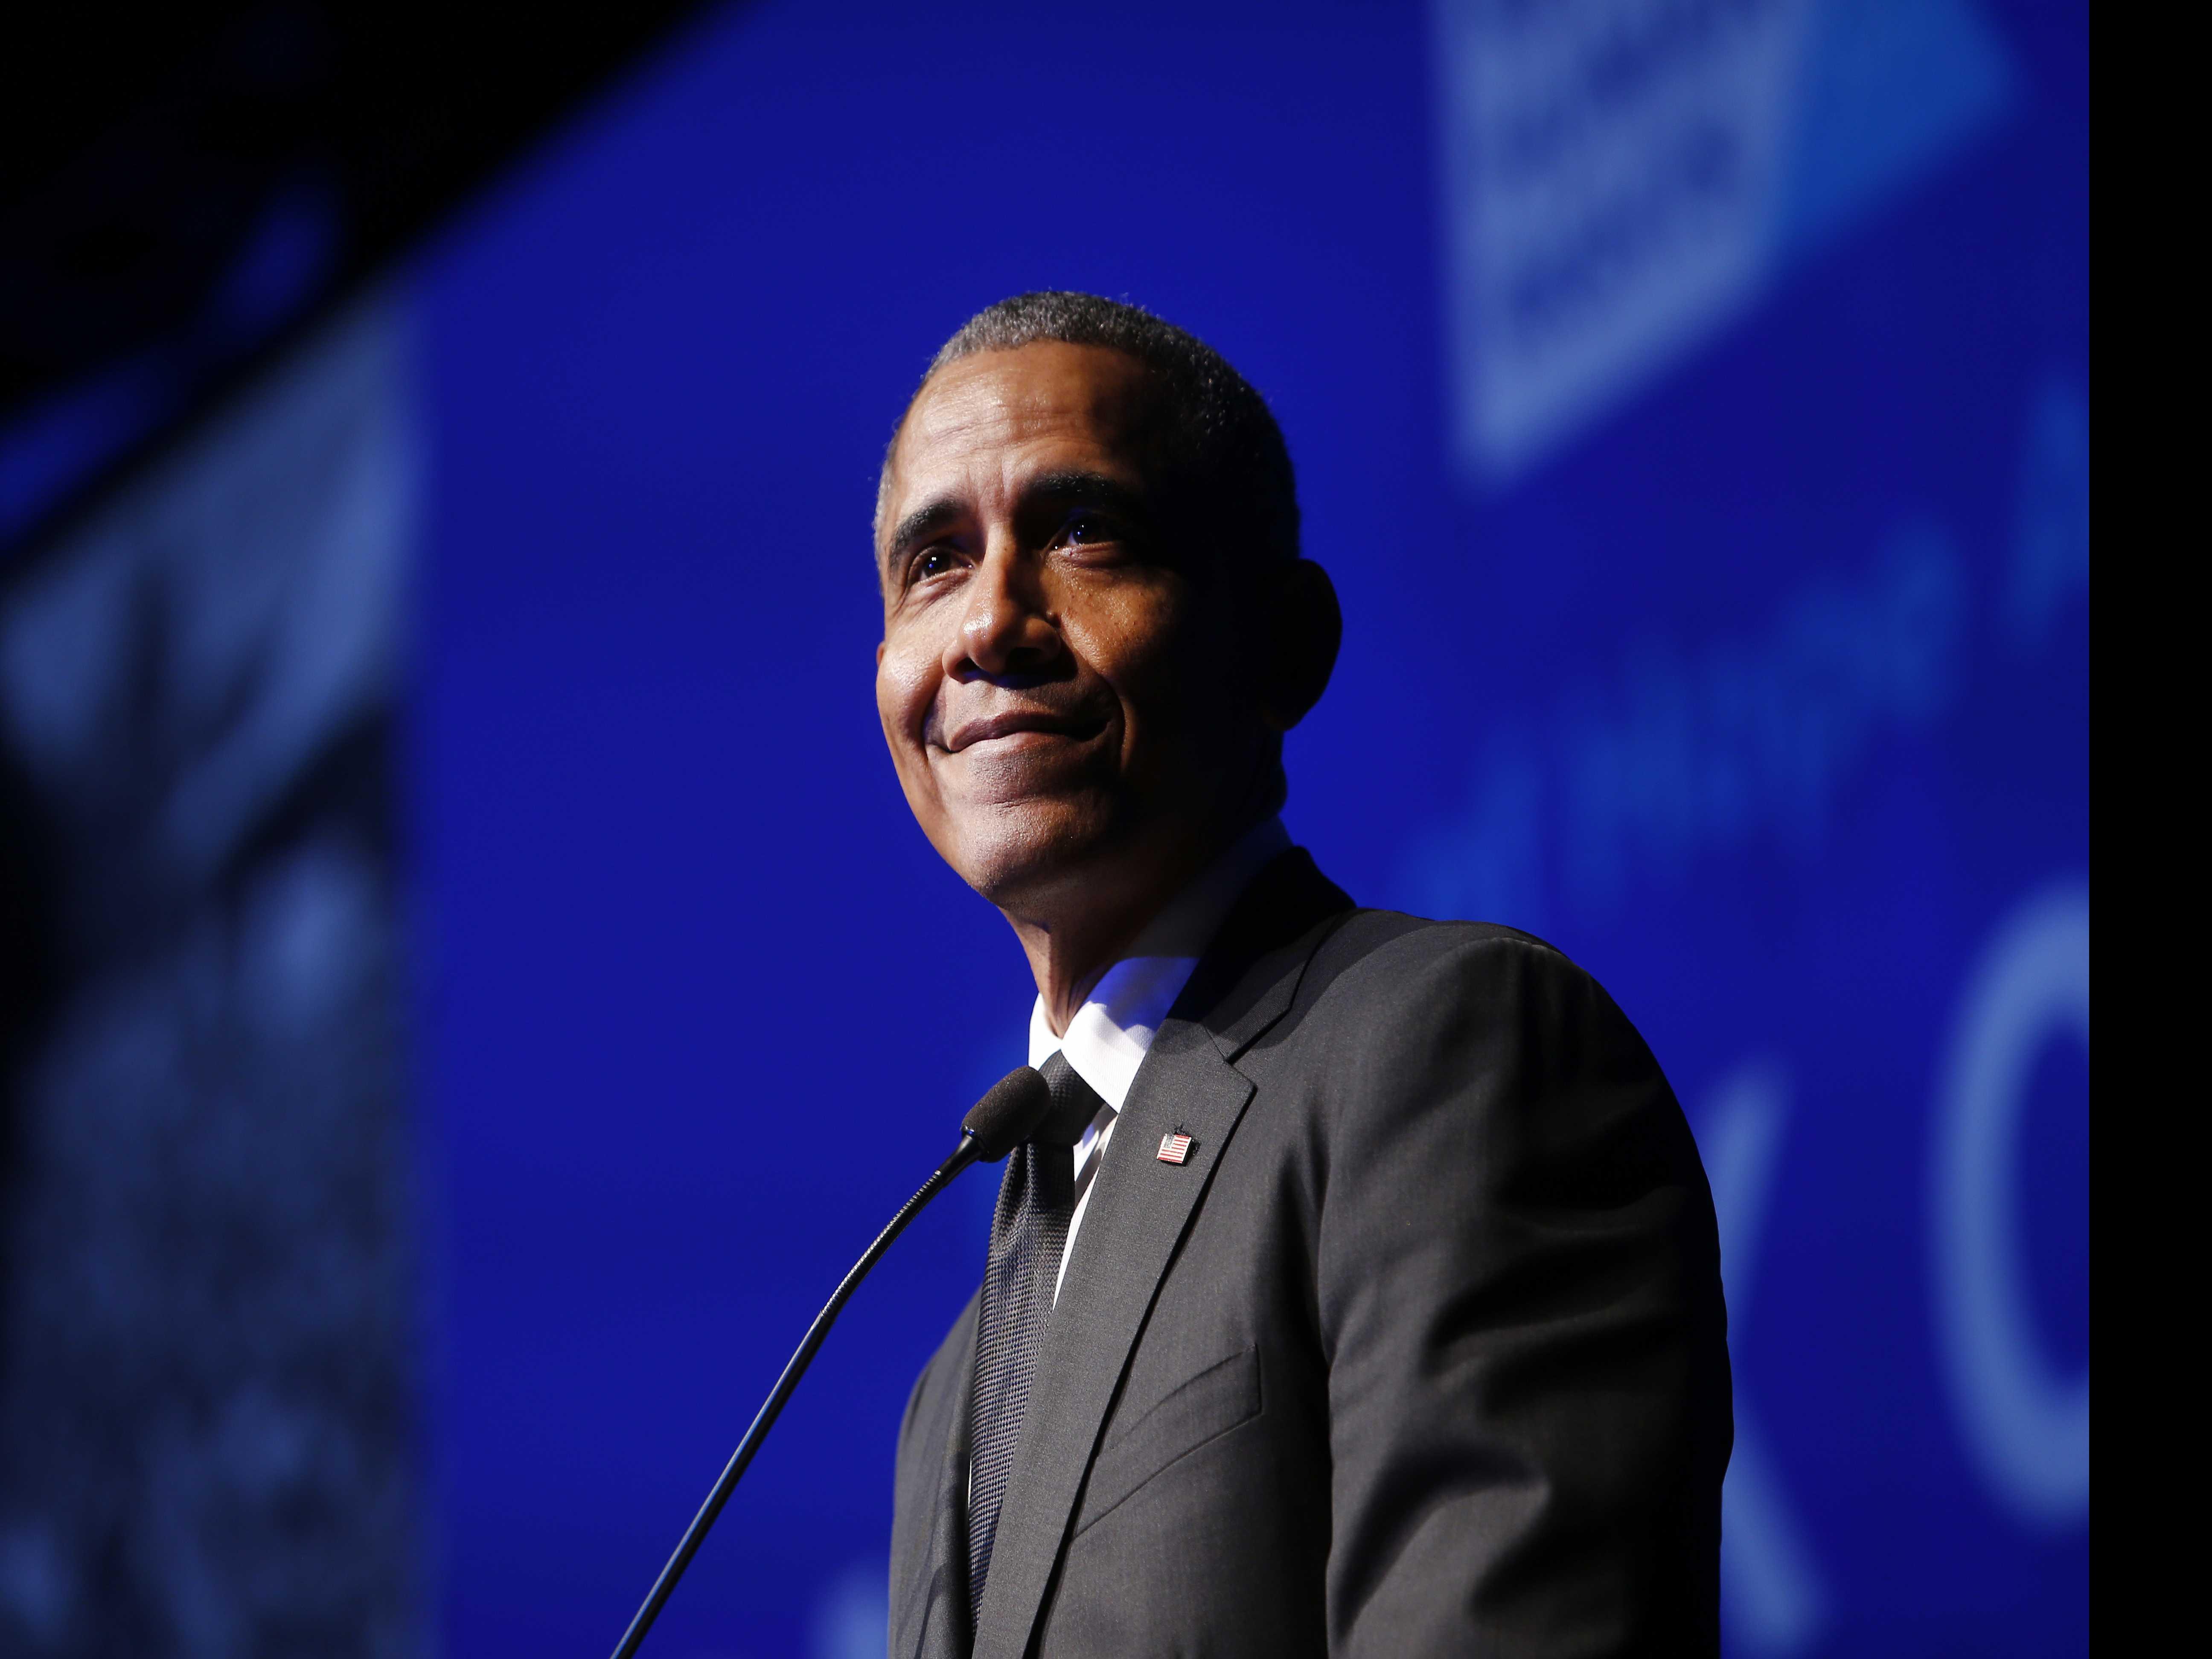 Listen: Barack Obama Appears on Miranda's Latest 'Hamilton' Song